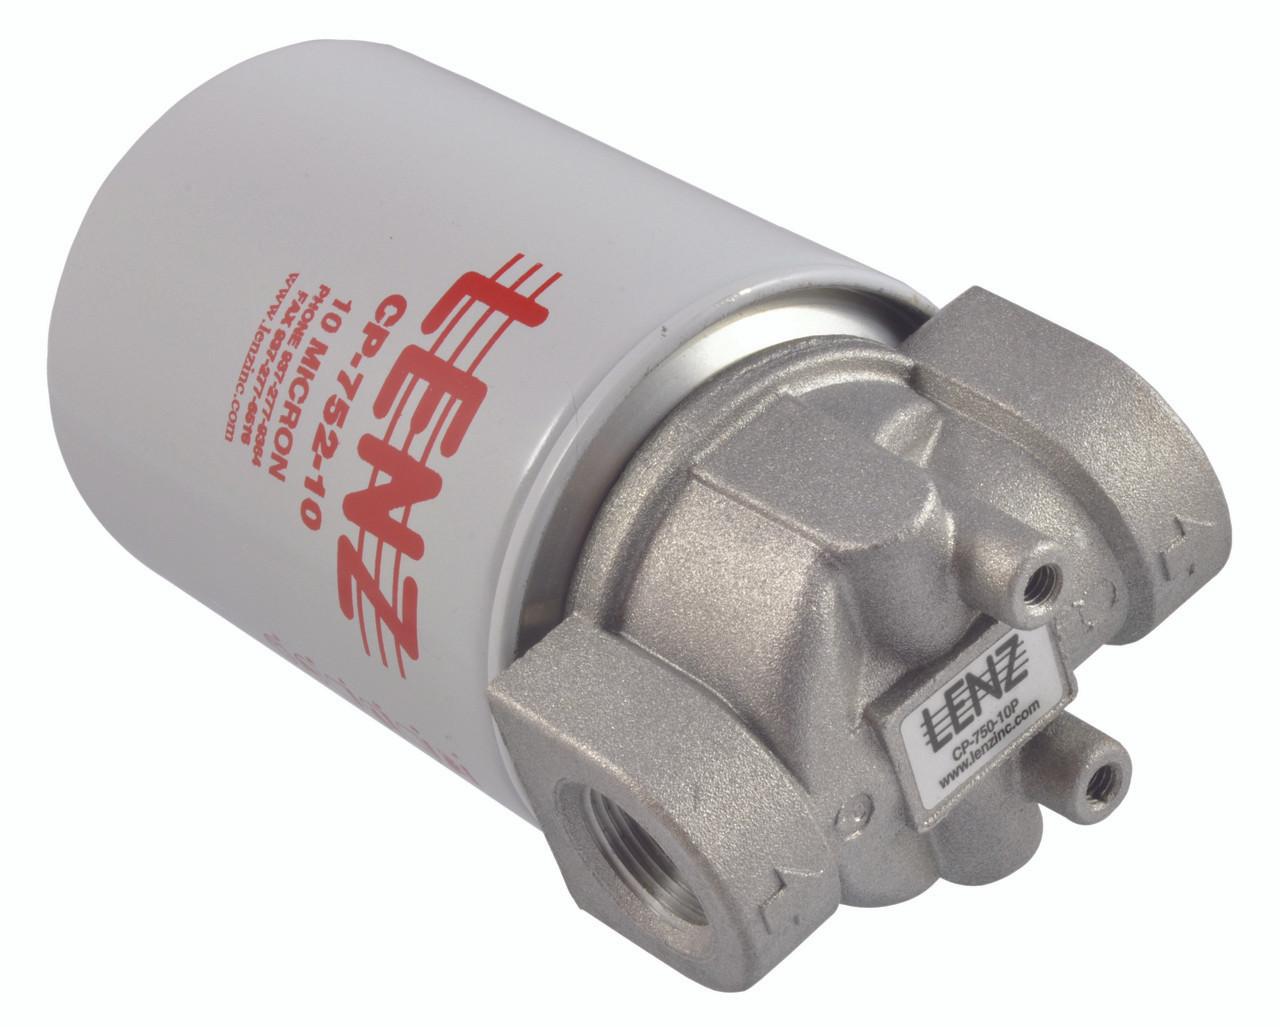 Seastar Solutions HP5815 Oil Filter For Marine Power Steering System